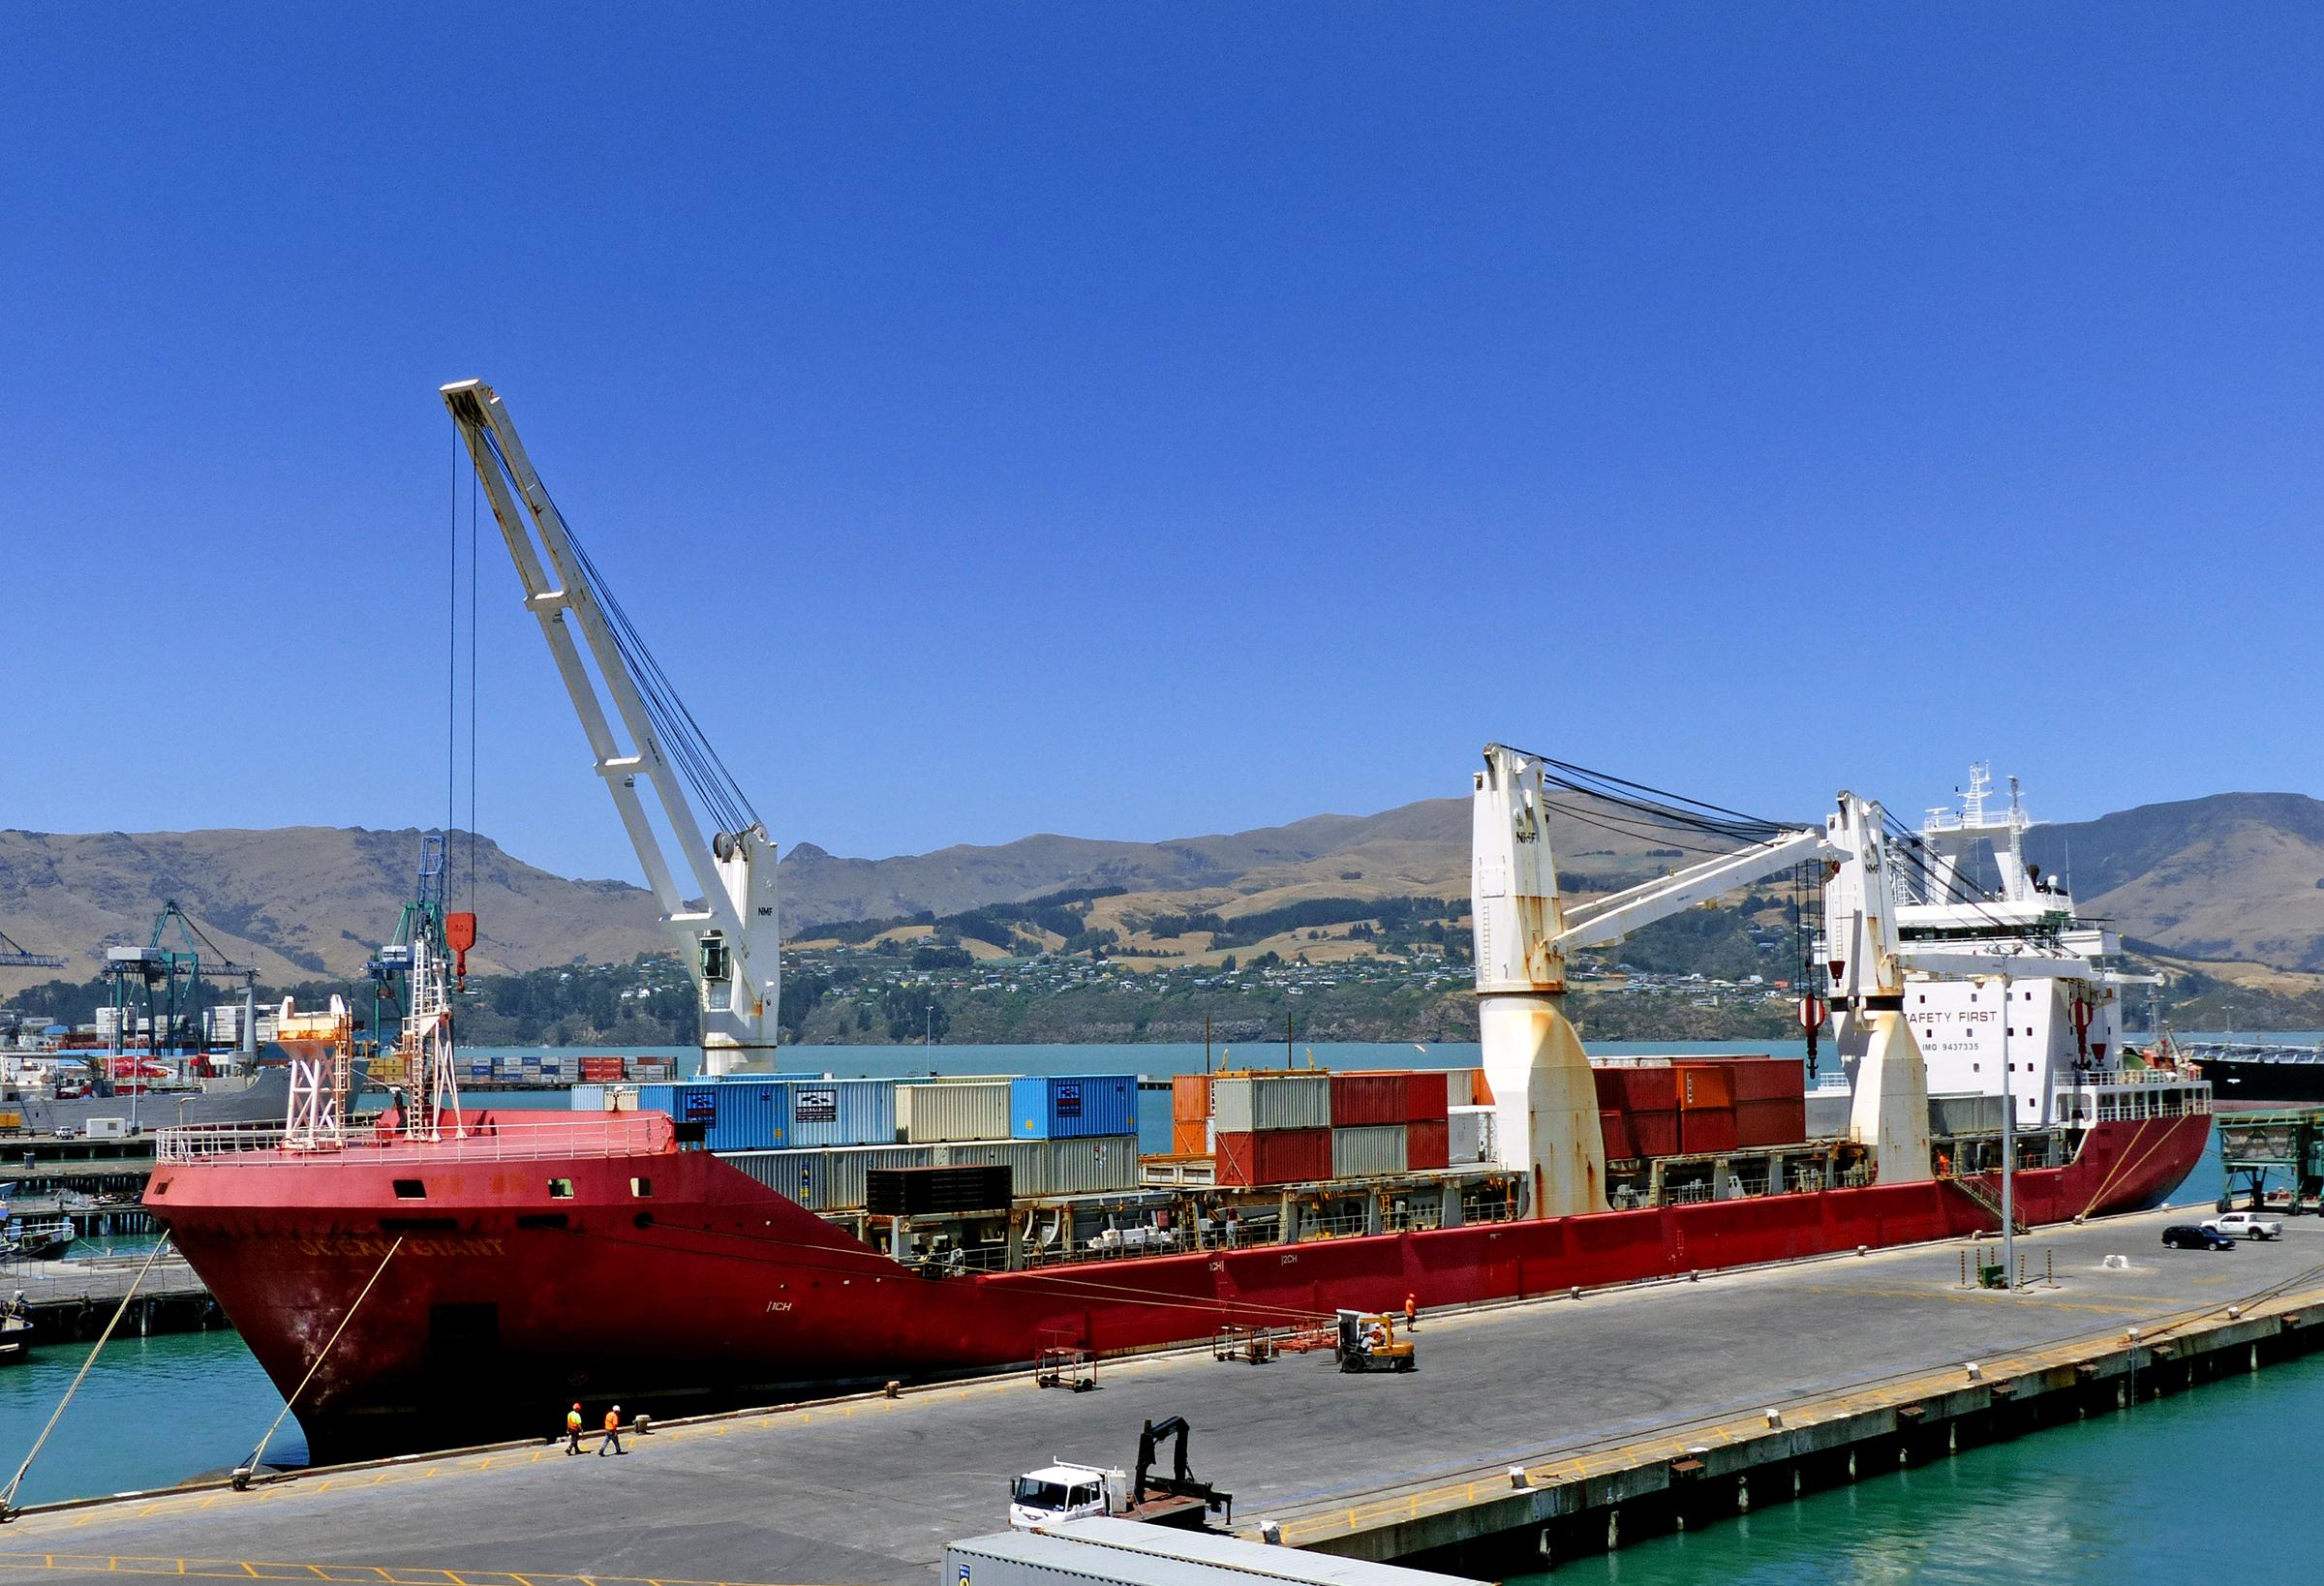 Gambar Laut Lautan Perahu Kendaraan Pelabuhan Kapal Kargo Jalan Air Feri Area Publik Infrastruktur Muatan Saluran Pengiriman Portlyttleton